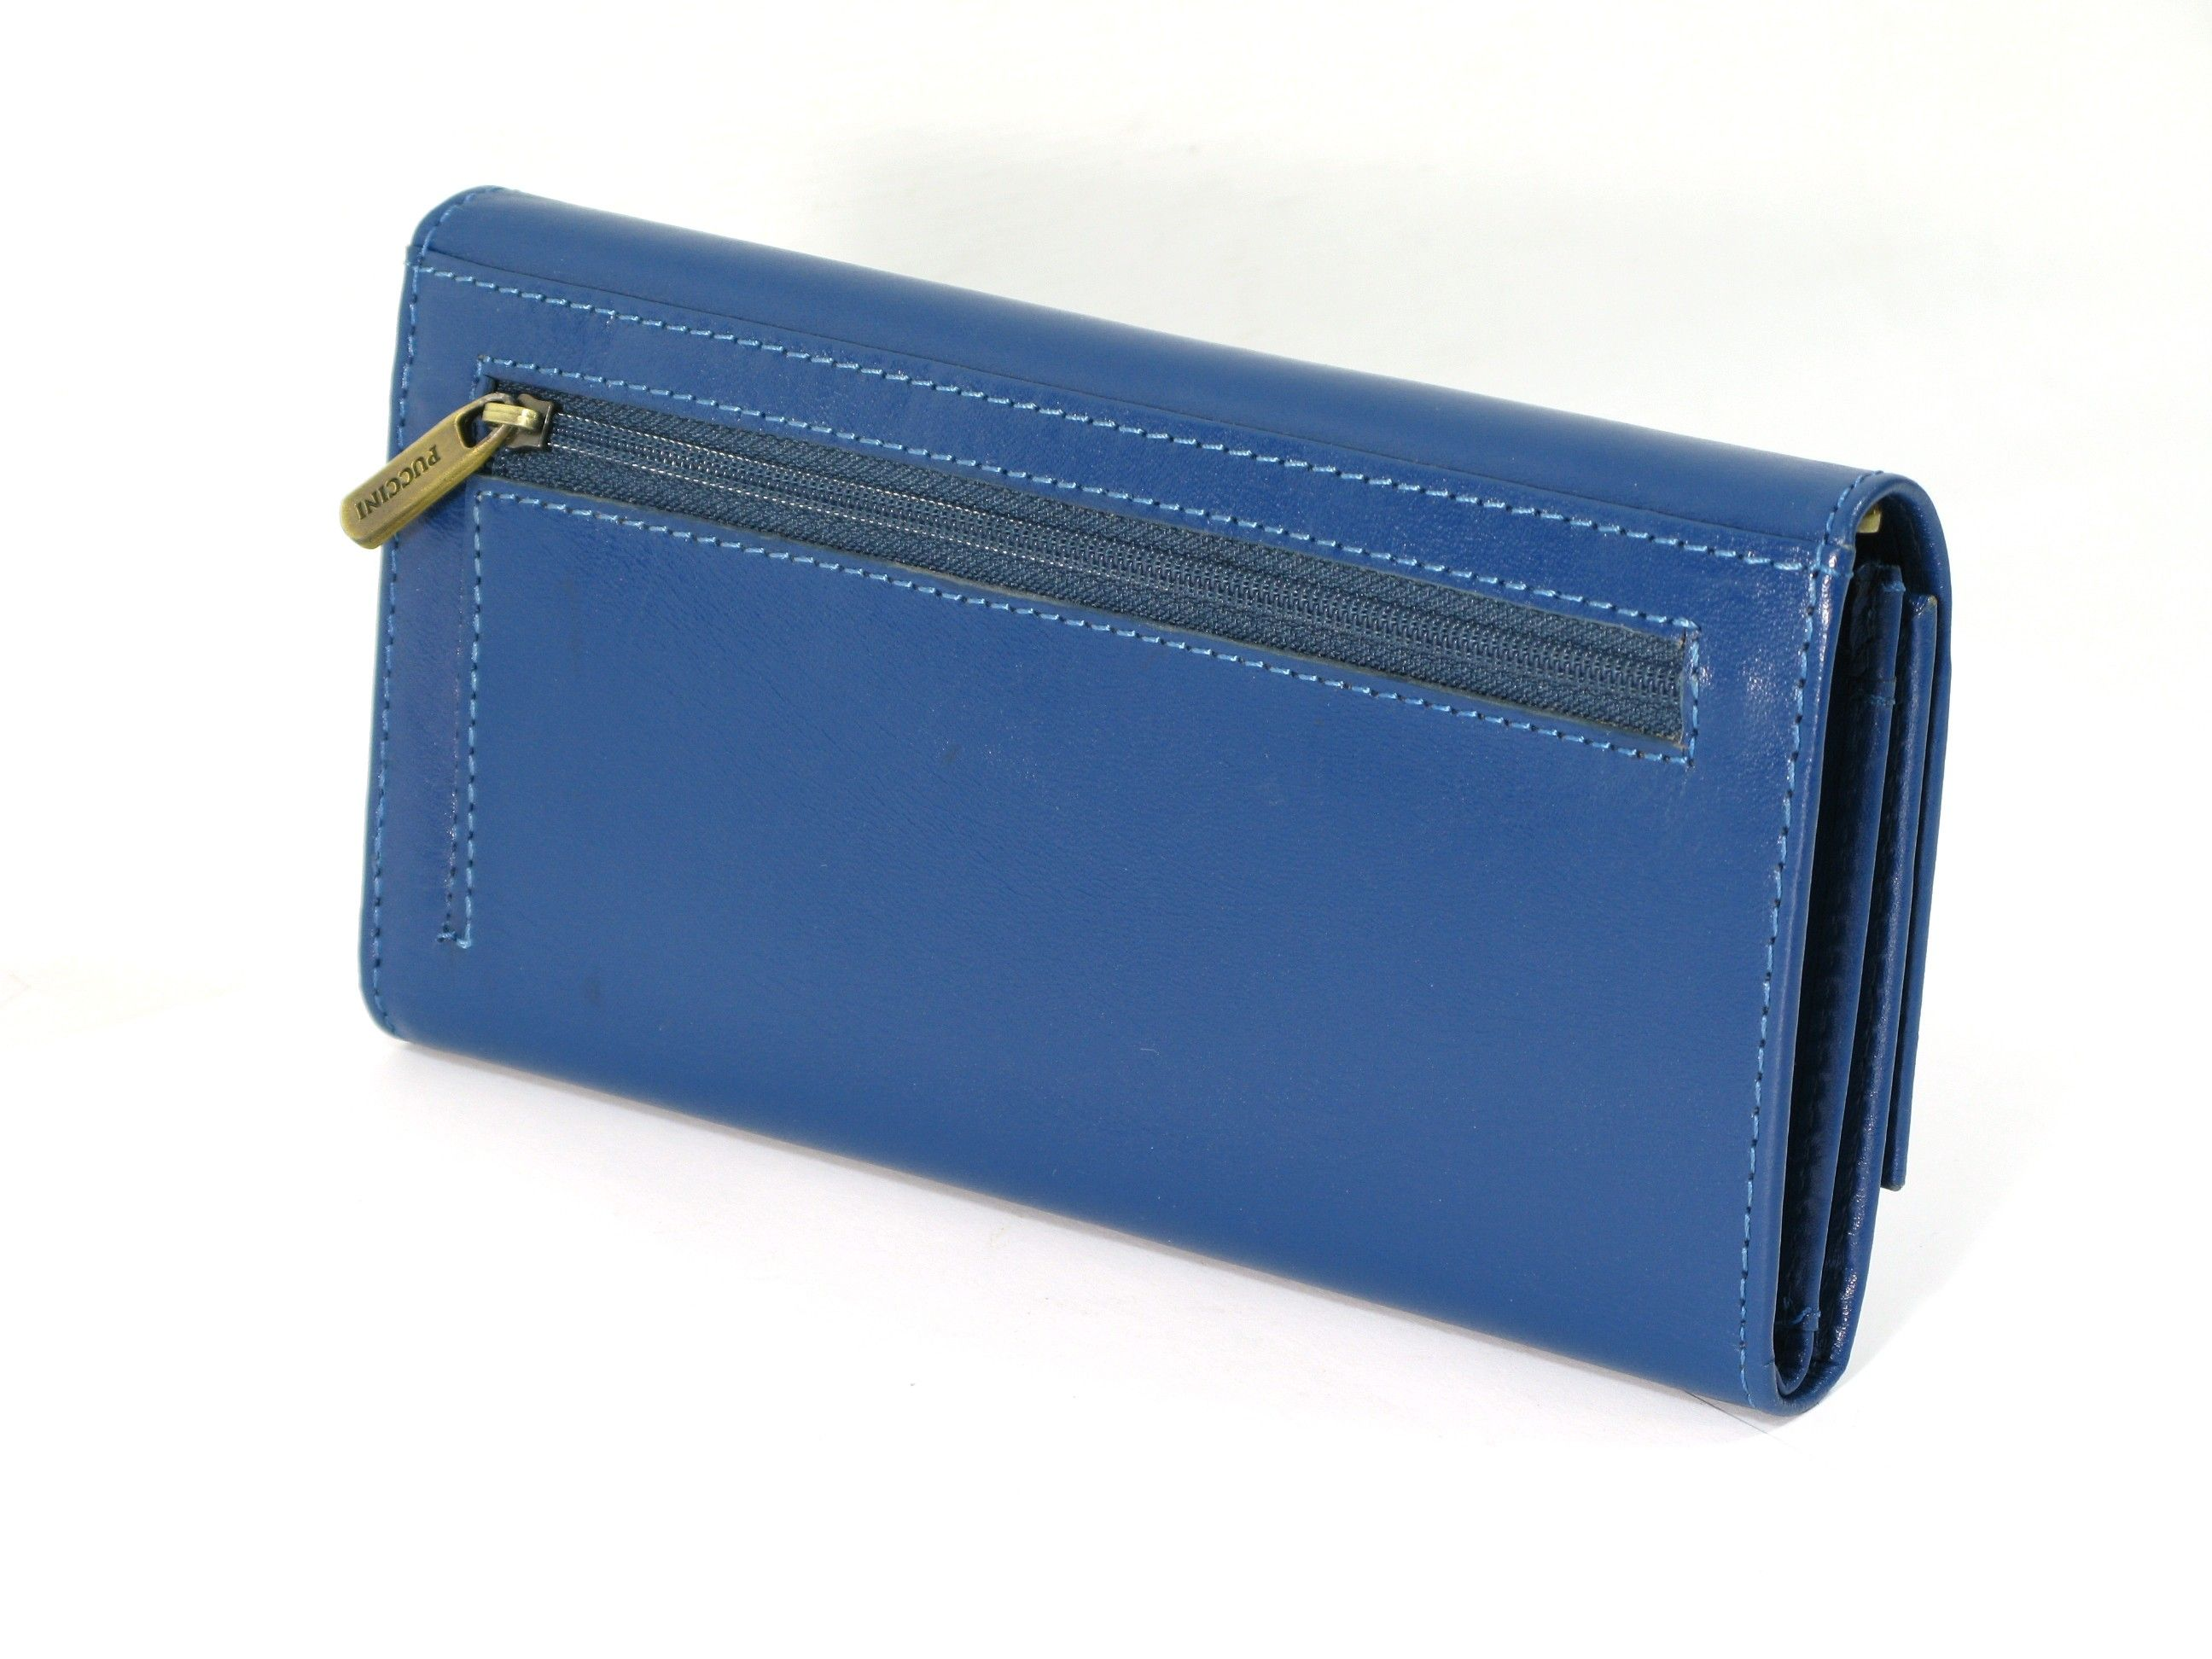 5bb7d36568fe8 DUŻY portfel damski PUCCINI P-1680125 skóra   organizer niebieski